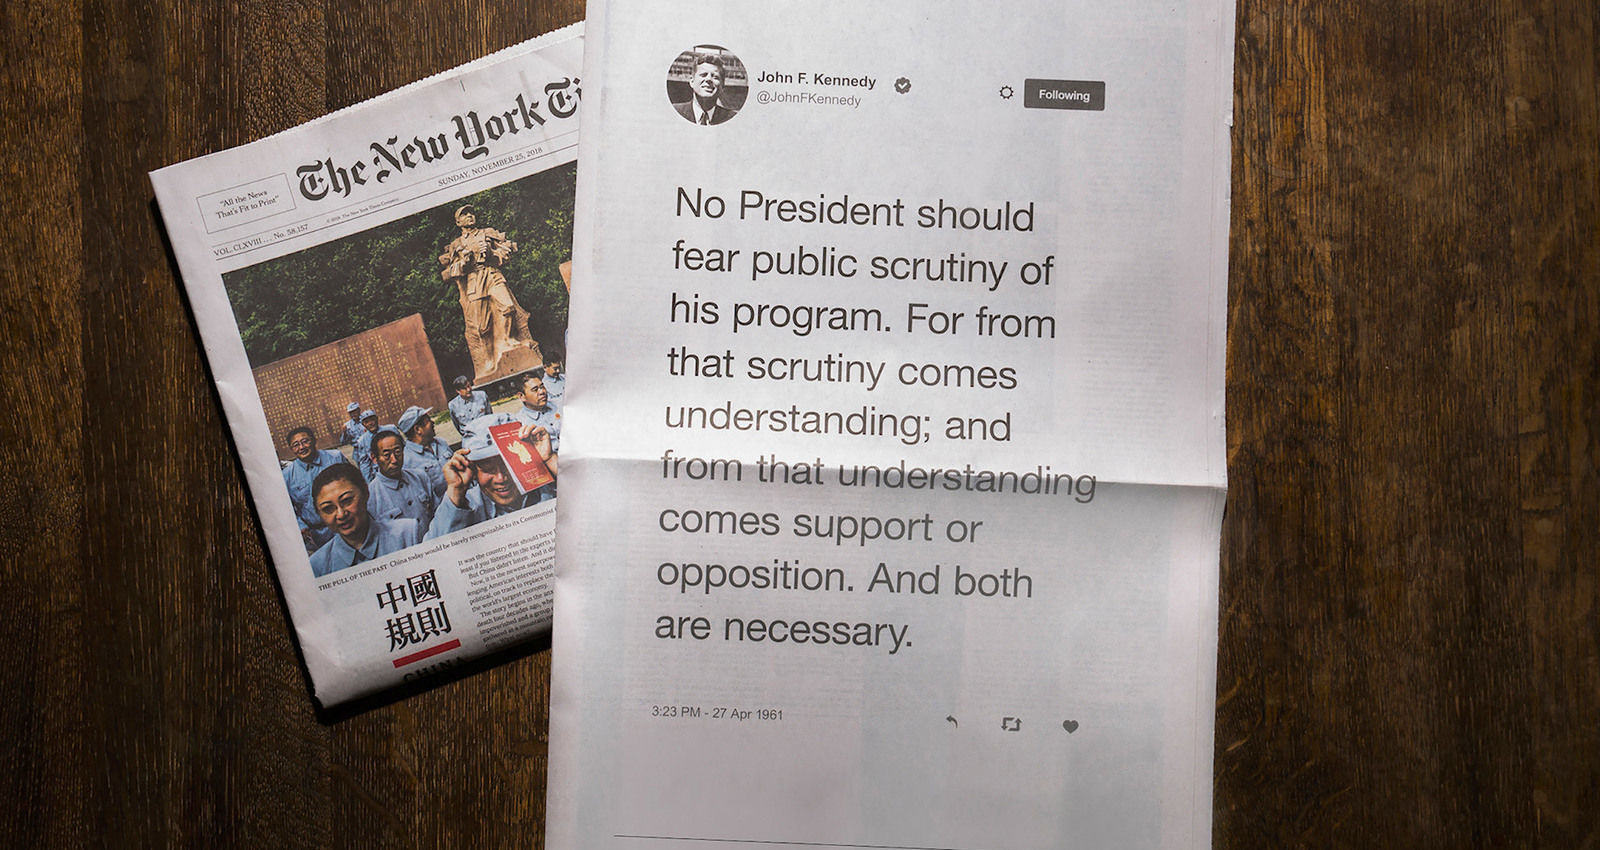 A President Tweets